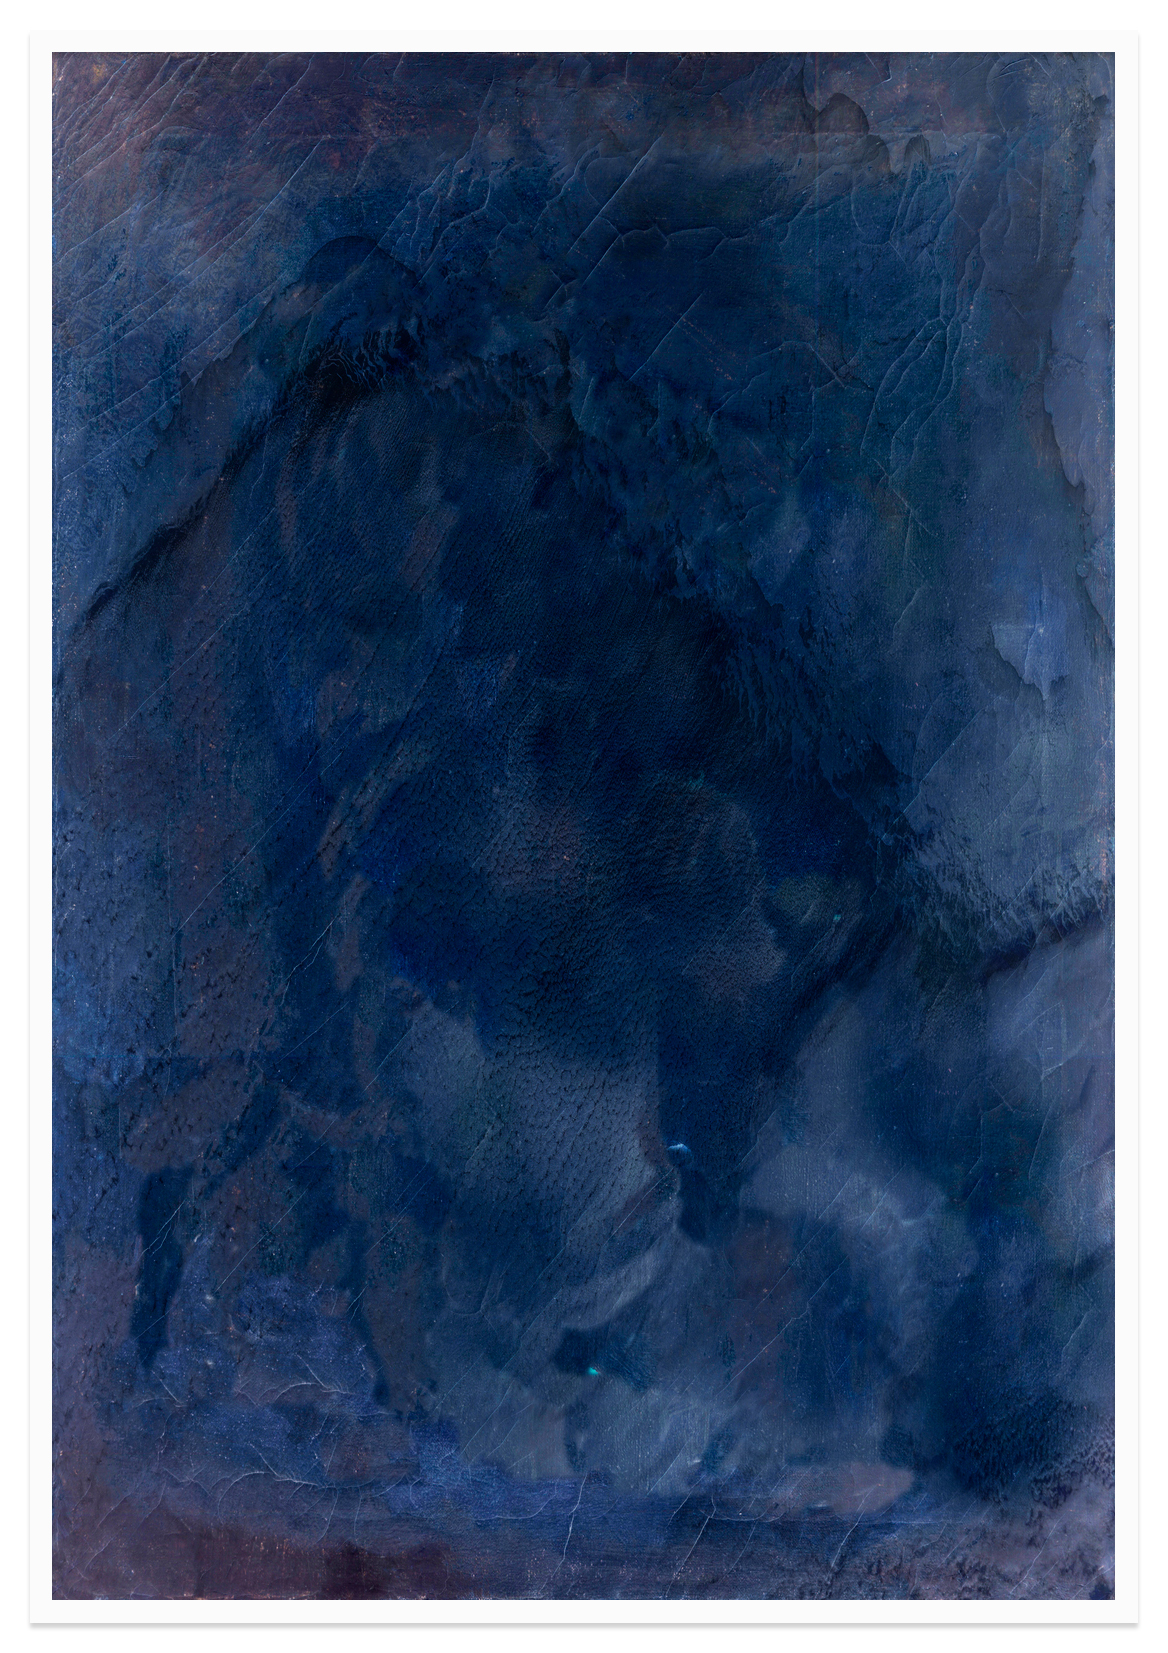 Case Simmons, Simmons & Burke, If Not Winter Composite #2, Kohn Gallery, Composite Image, Lightjet Print, Digital Collage,Digital Art, Photoshop Collage, Contemporary Collage,Case Simmons Art, Case Simmons Artist, Collage Fine Art, Hyper Collage, Digital Painting,Digital Landscape